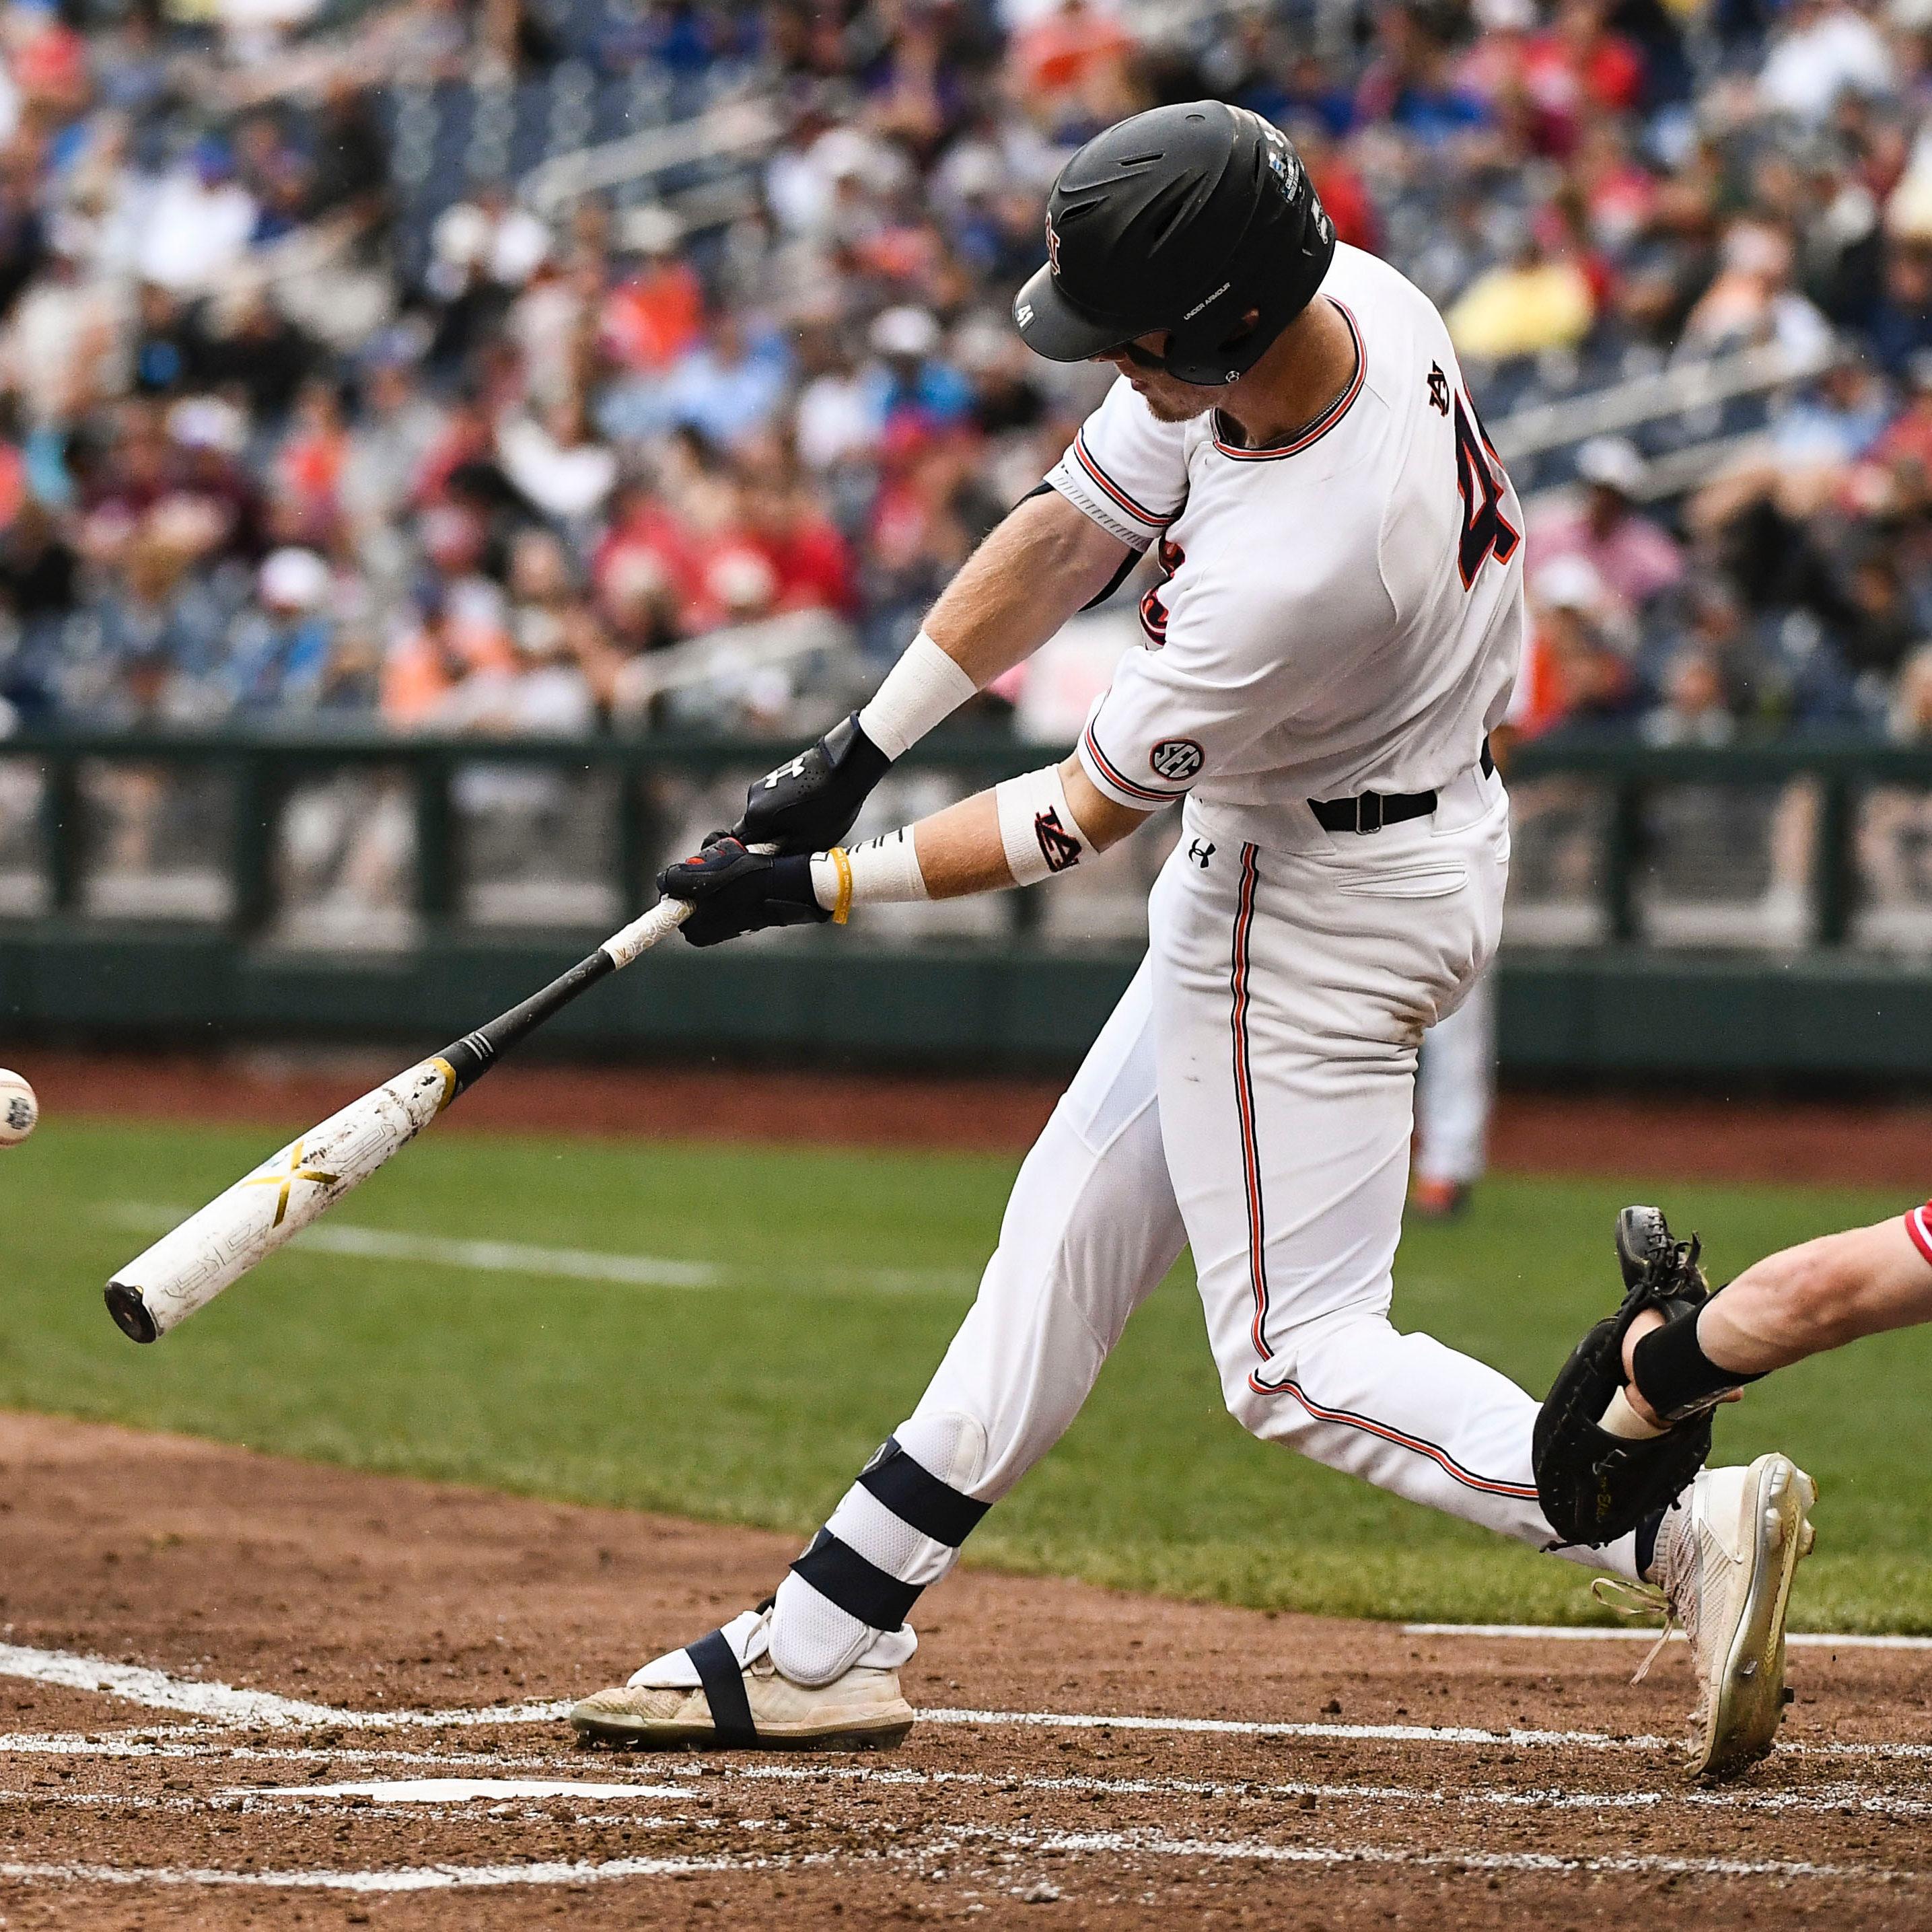 Steven Williams (41) Baseball vs Louisville on Tuesday, June 18, 2019, in Omaha, NE. Cat Wofford/Auburn Athletics